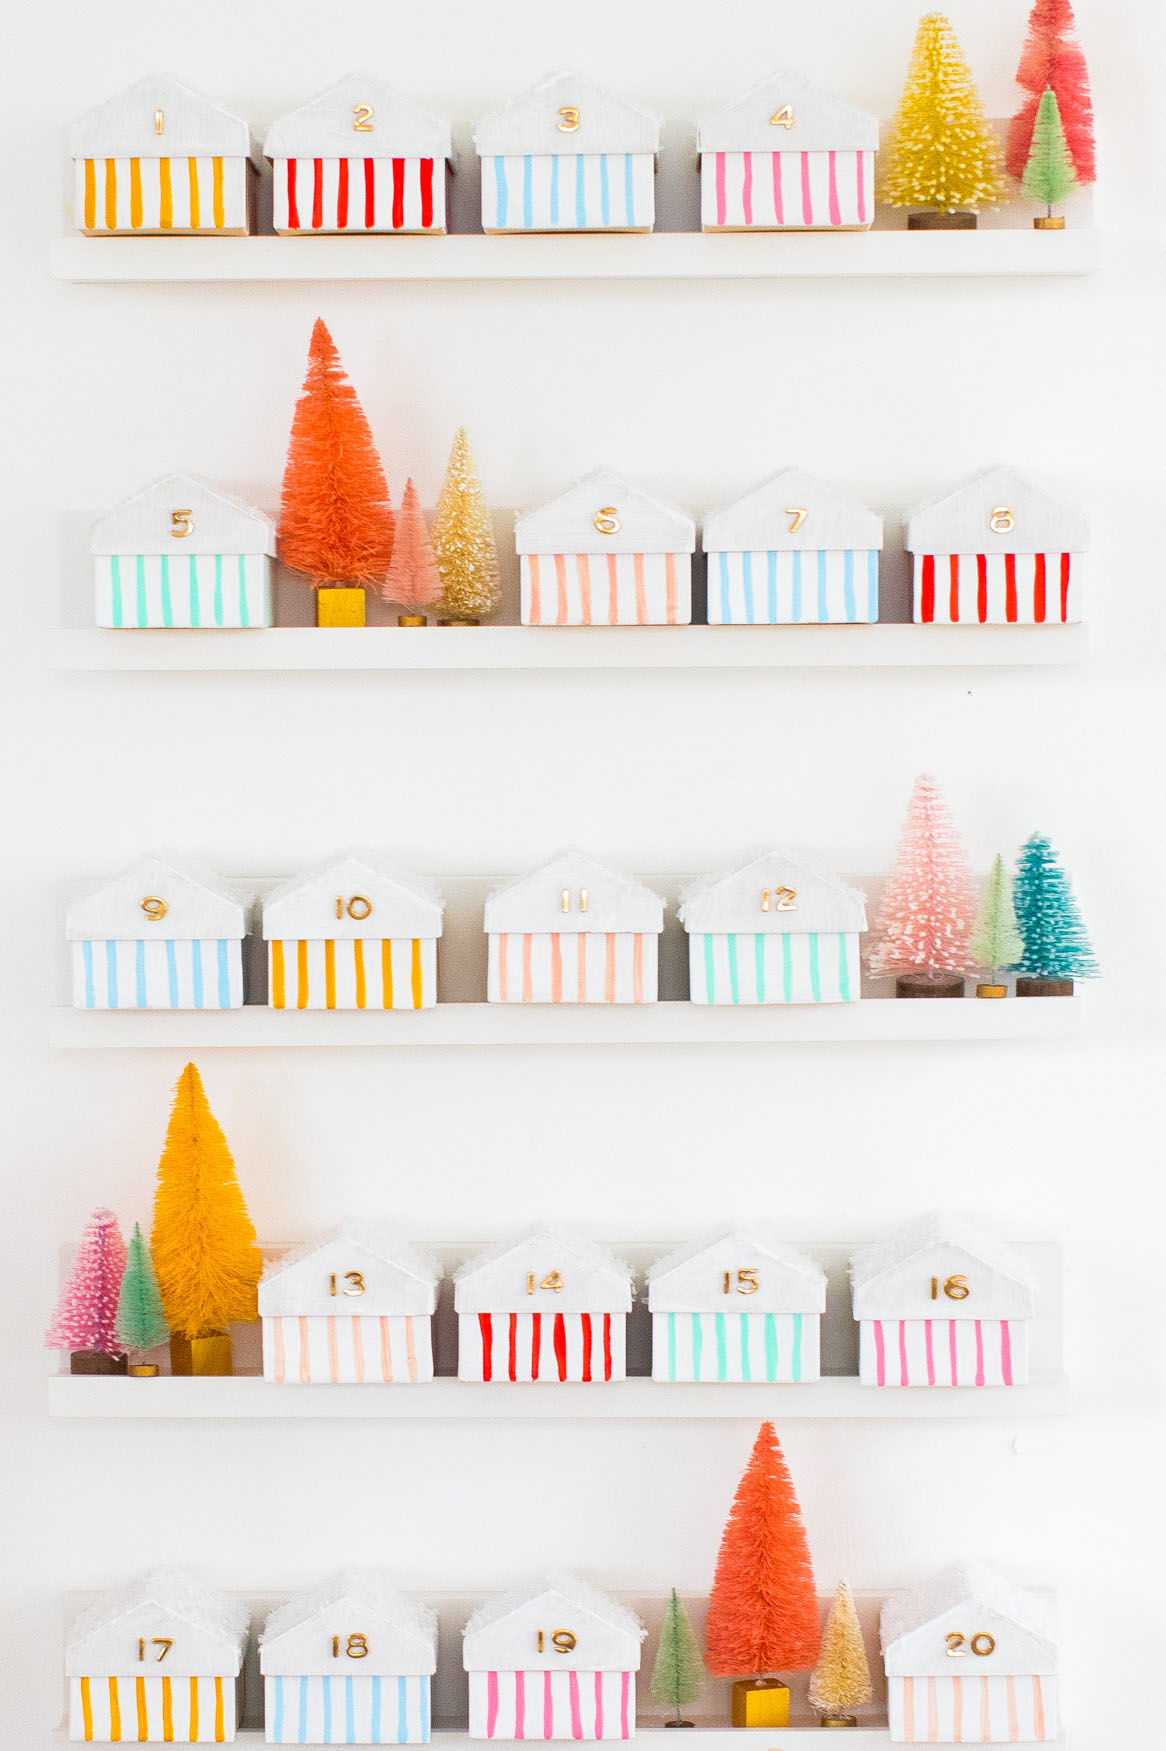 DIY house advent calendar from Sugar & Cloth